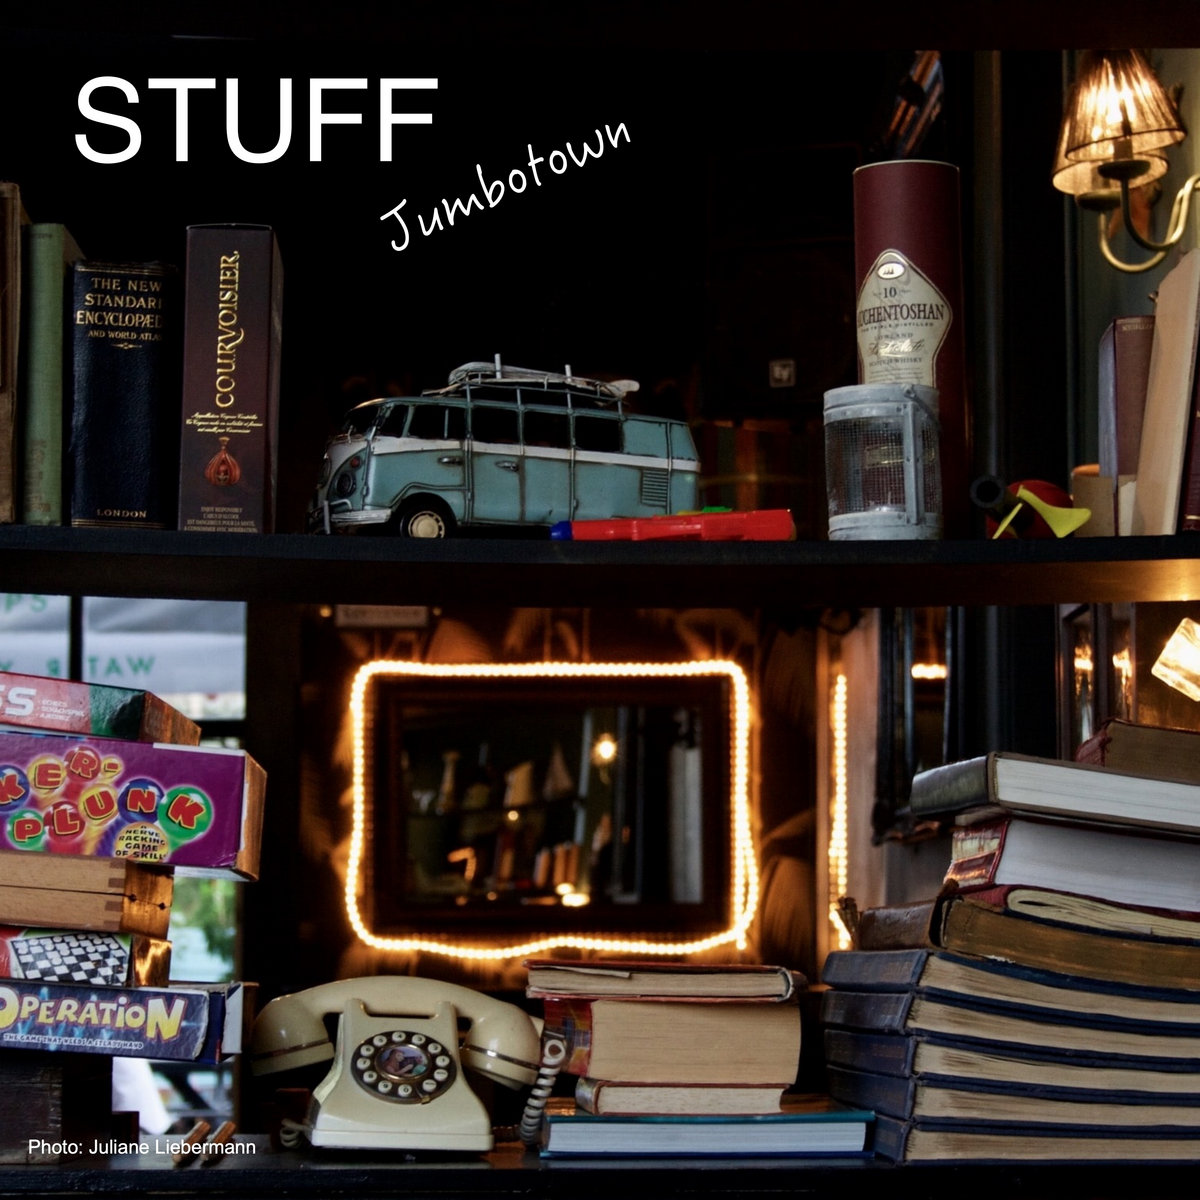 Stuff by Jumbotown